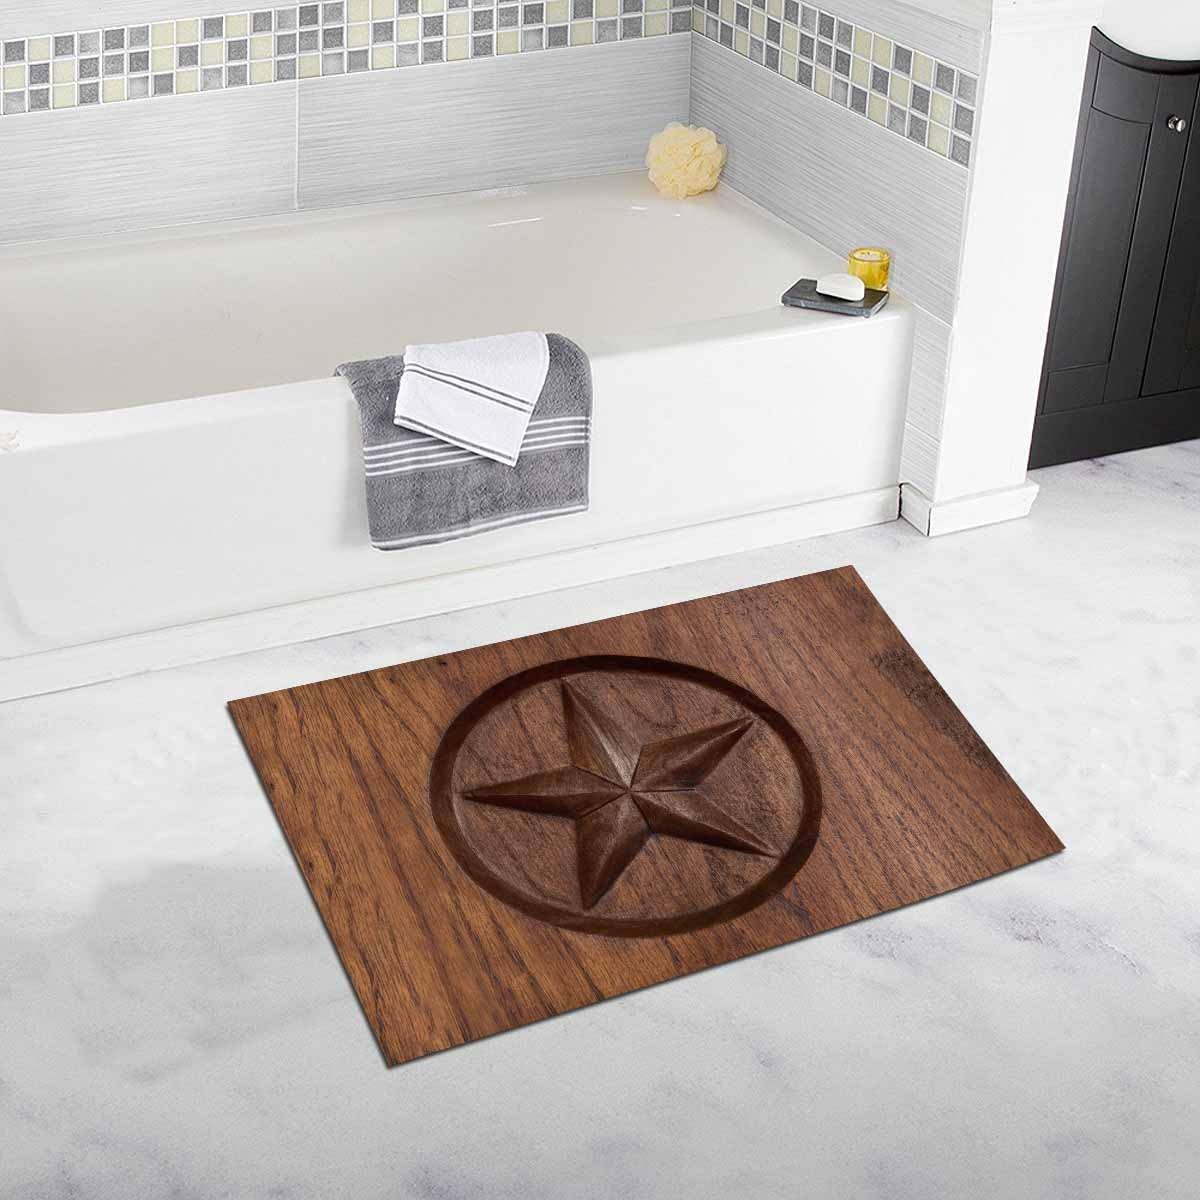 INTERESTPRINT Western Texas Star in Wood Decor Non Slip Bath Rug Mat Absorbent Bathroom Floor Mat Doormat Large Size 20 x 32 Inches